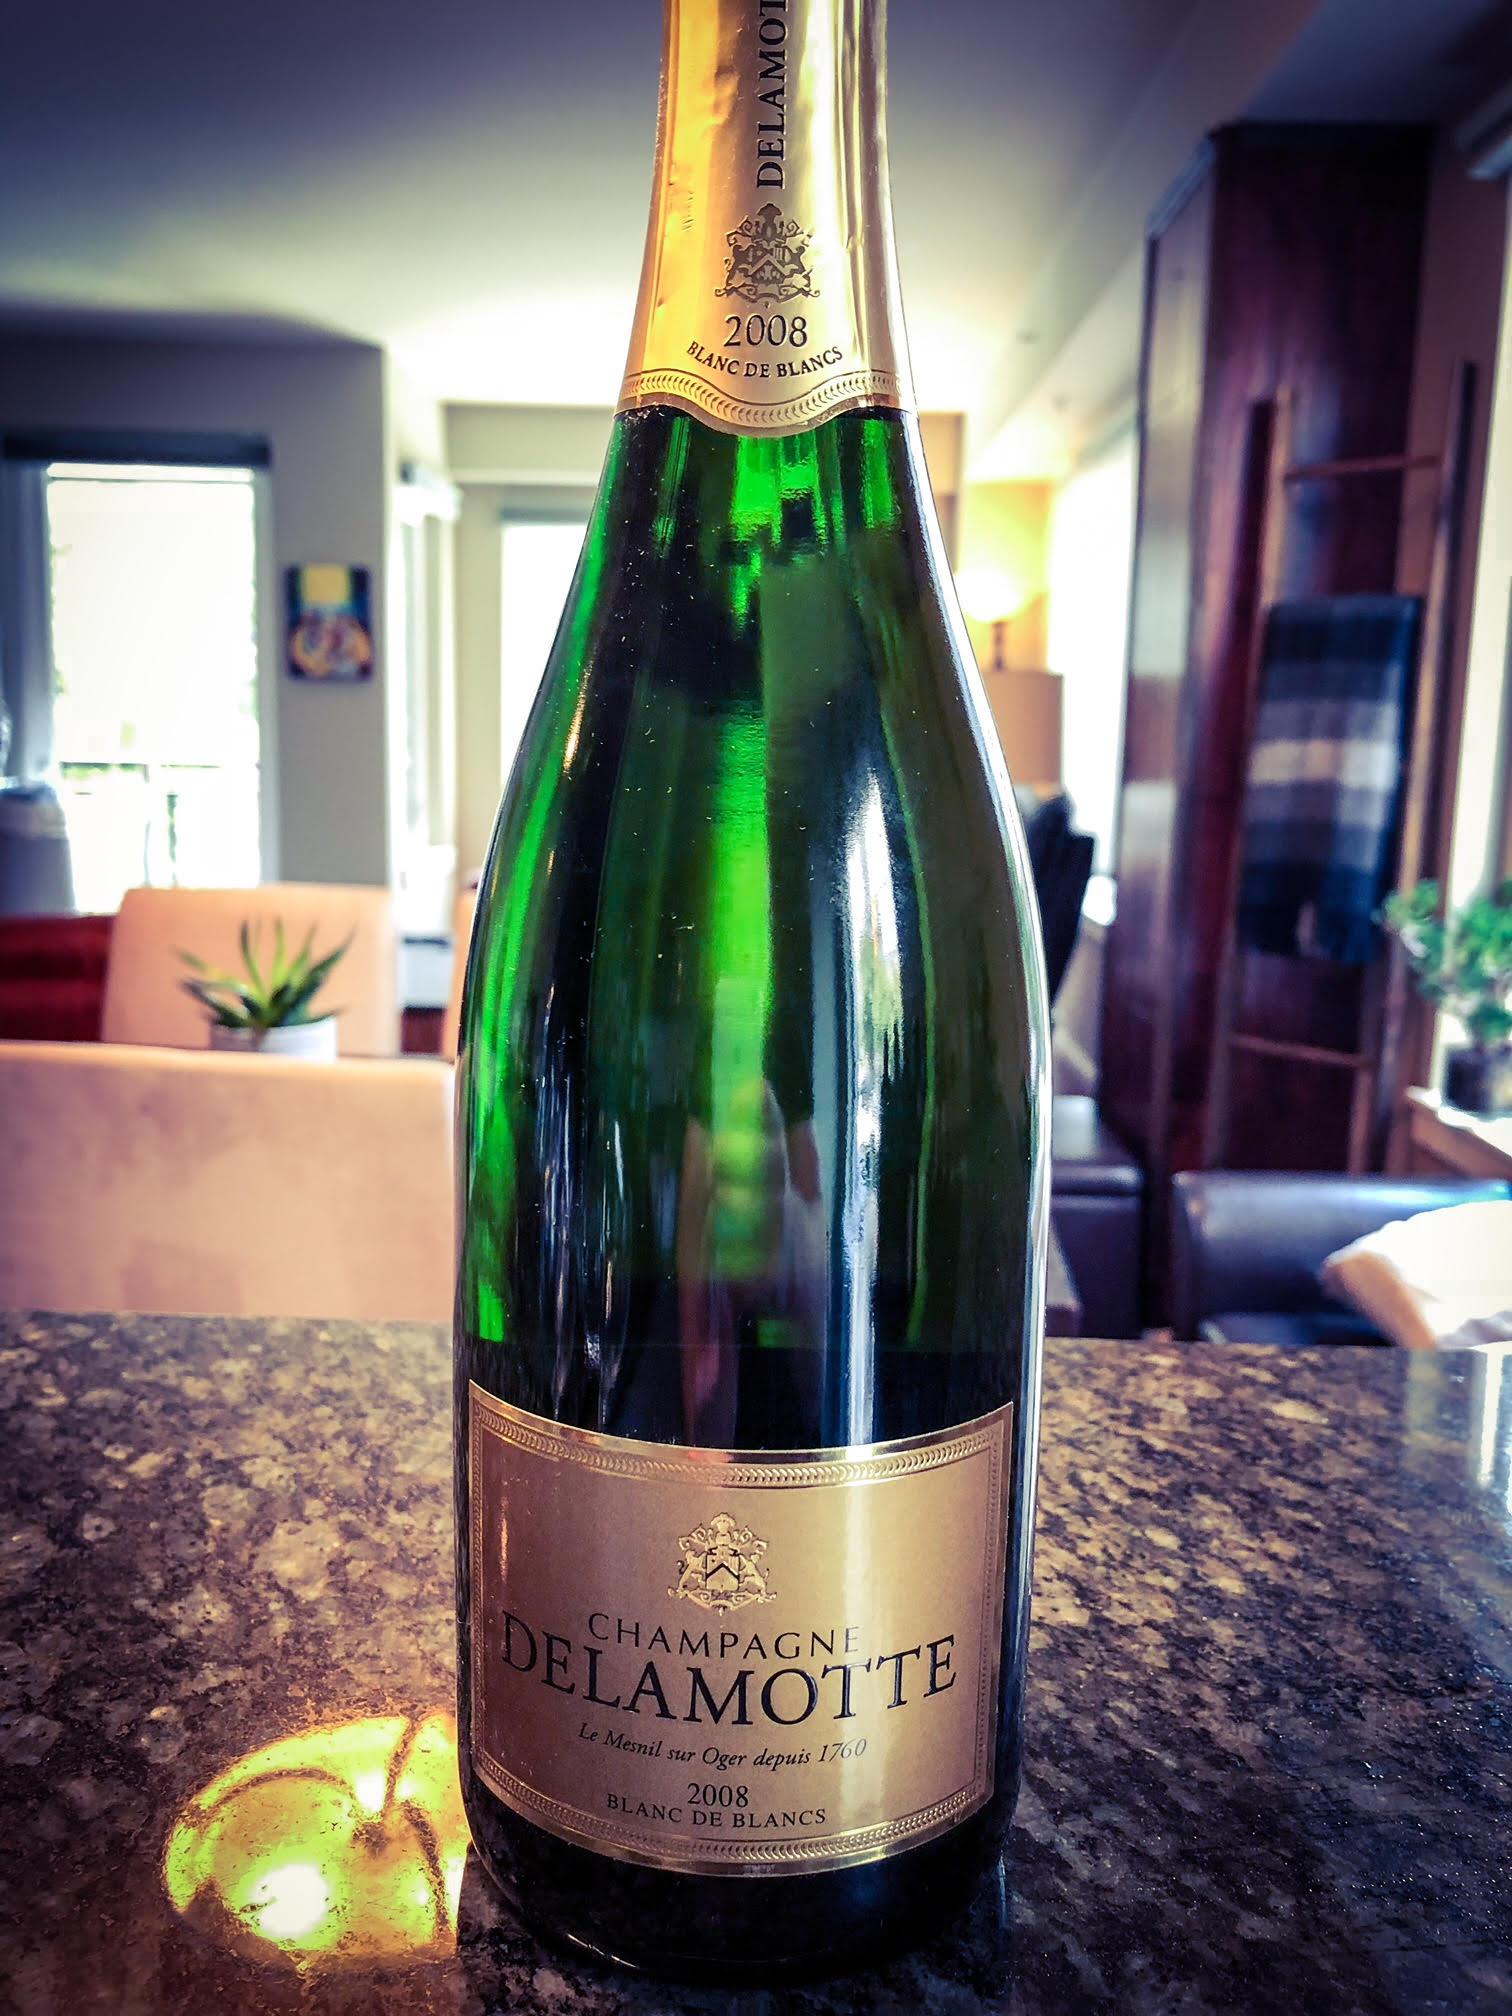 Champagne Salon and Delamotte — Washington Wine Blog